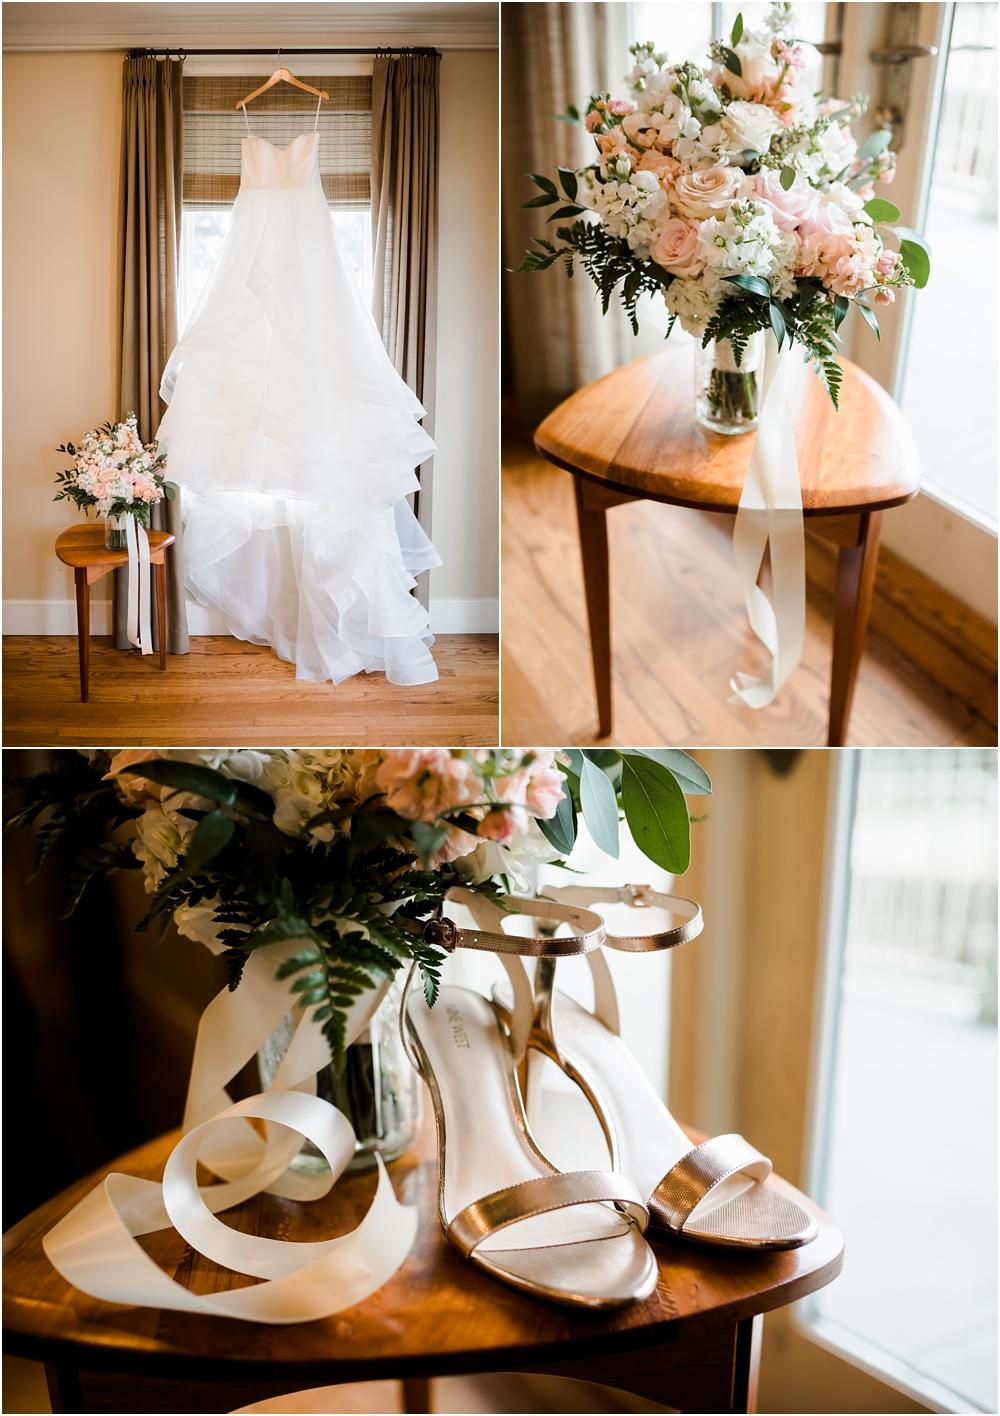 pensacola-wedding-photographer-kiersten-grant-3.jpg